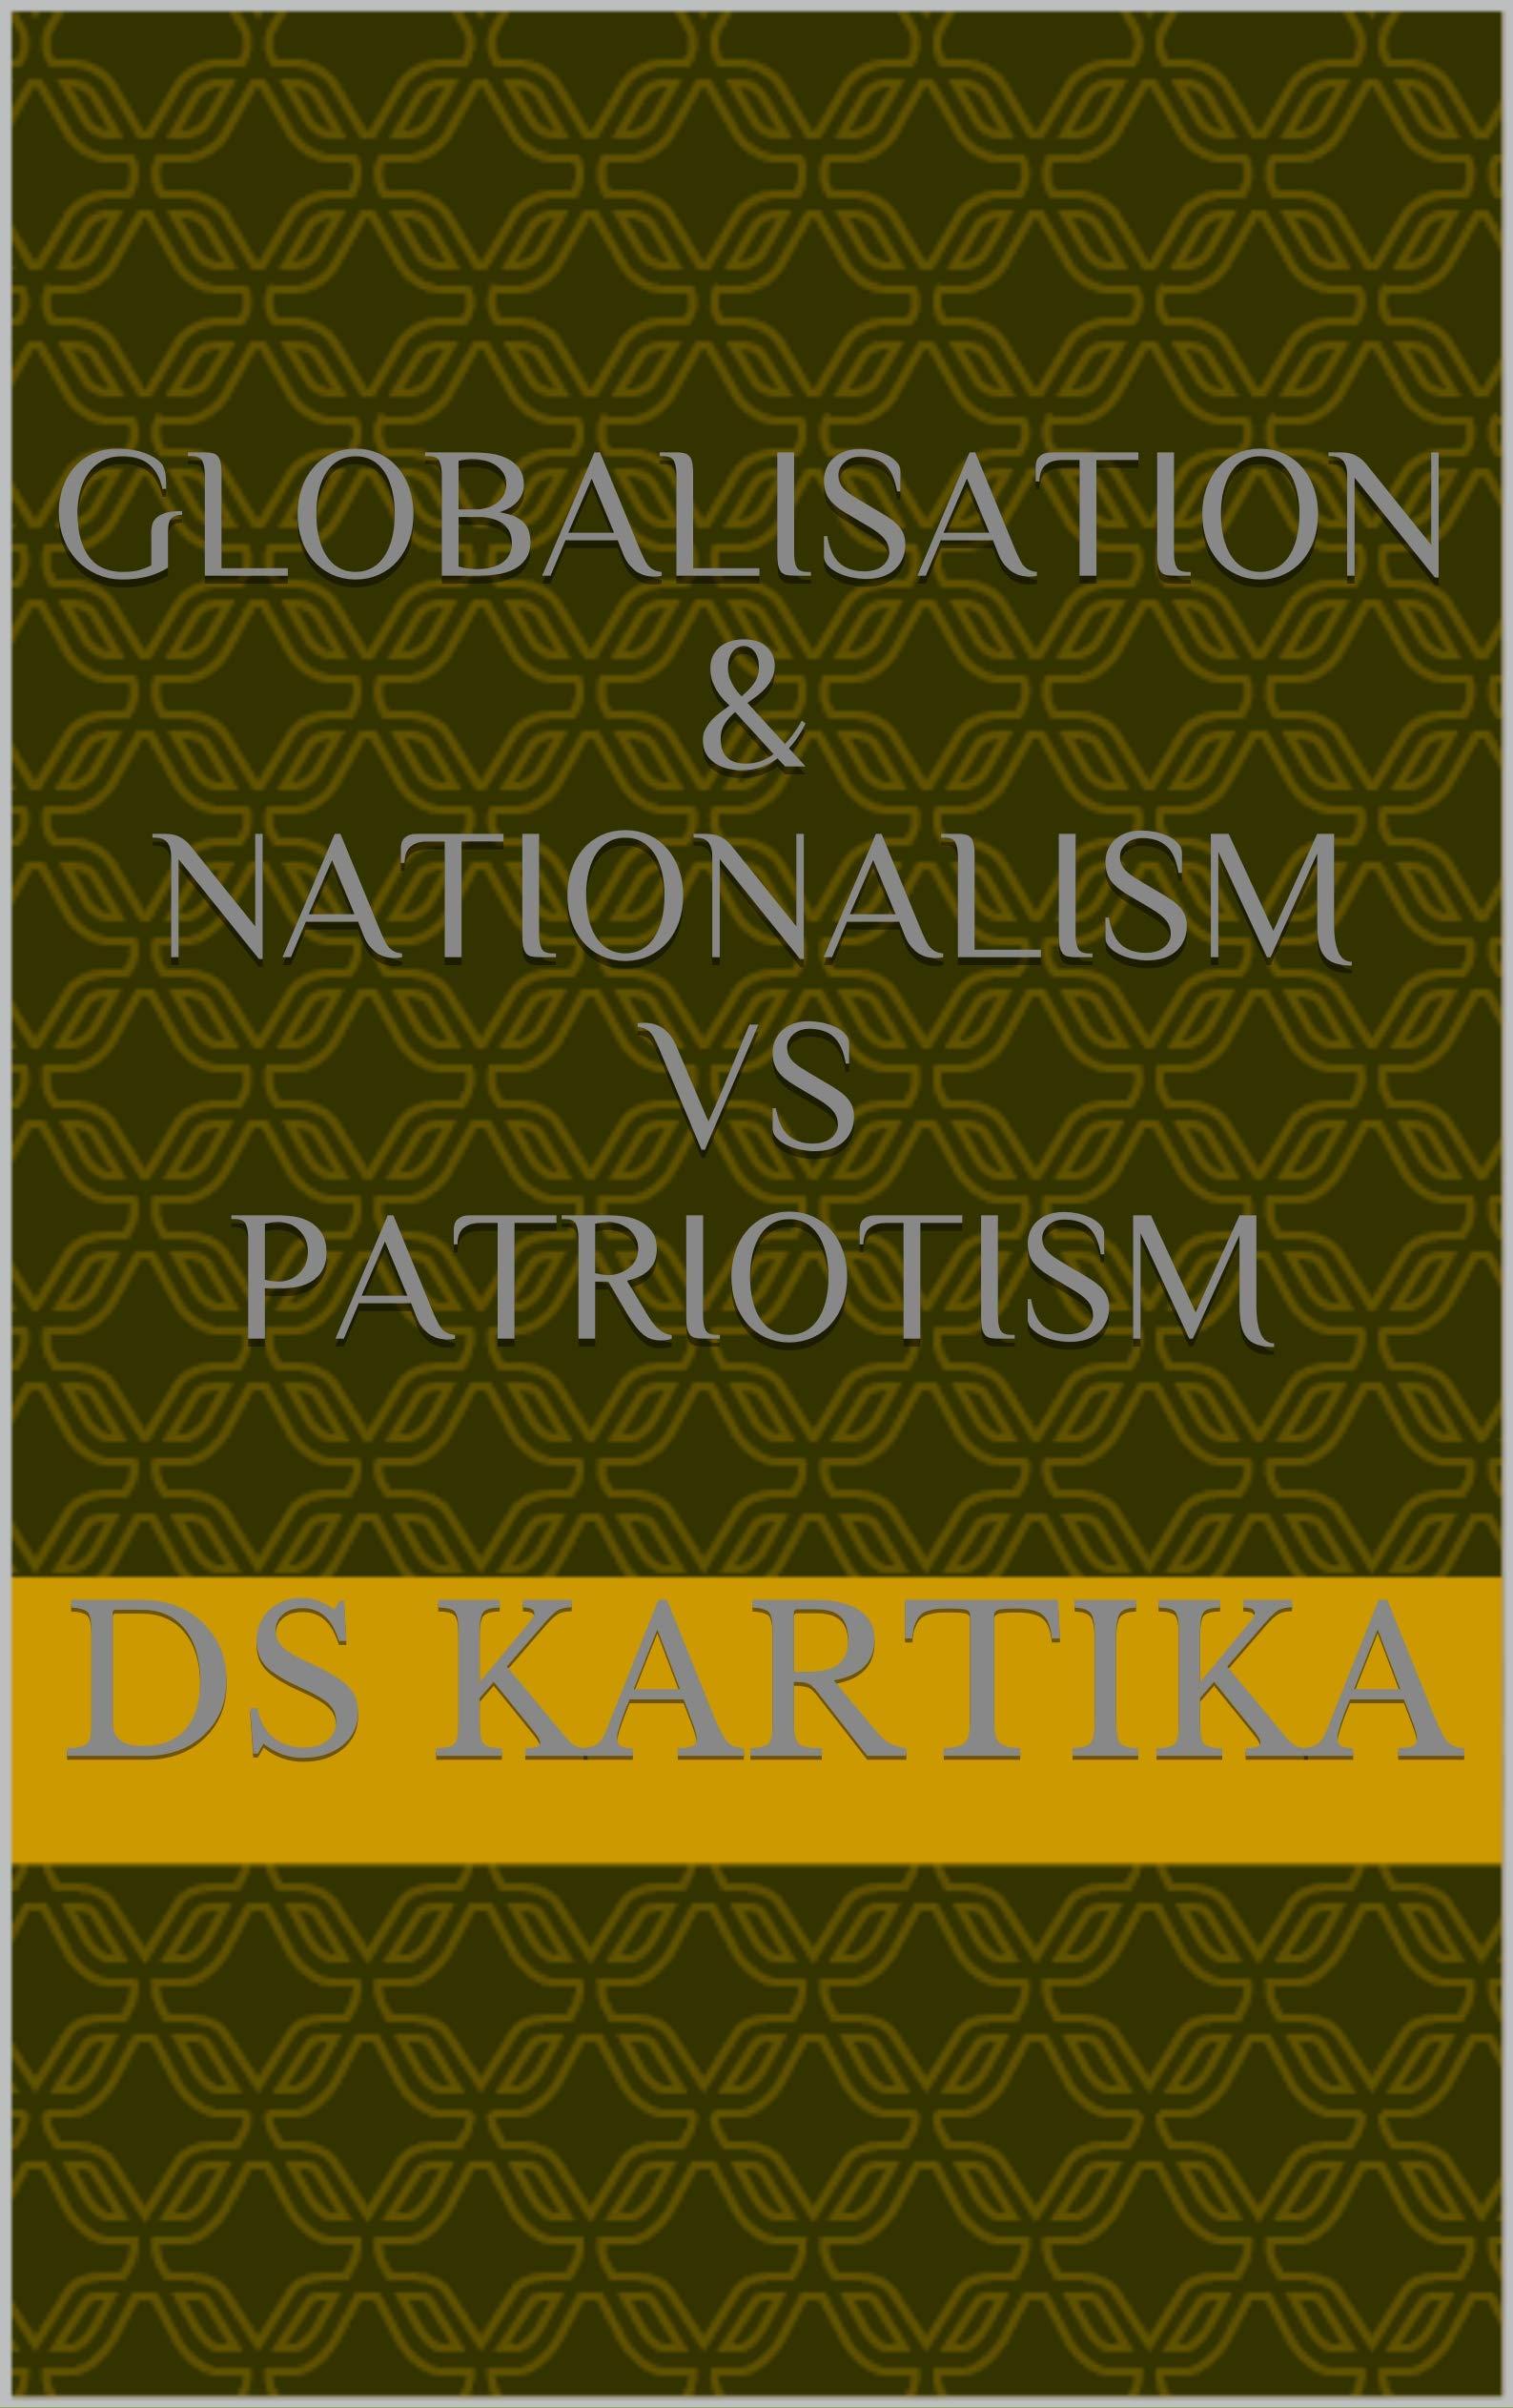 GLOBALISATION & NATIONALISM VS PATRIOTISM (UNIQCO'S NON FICTION Book 2)